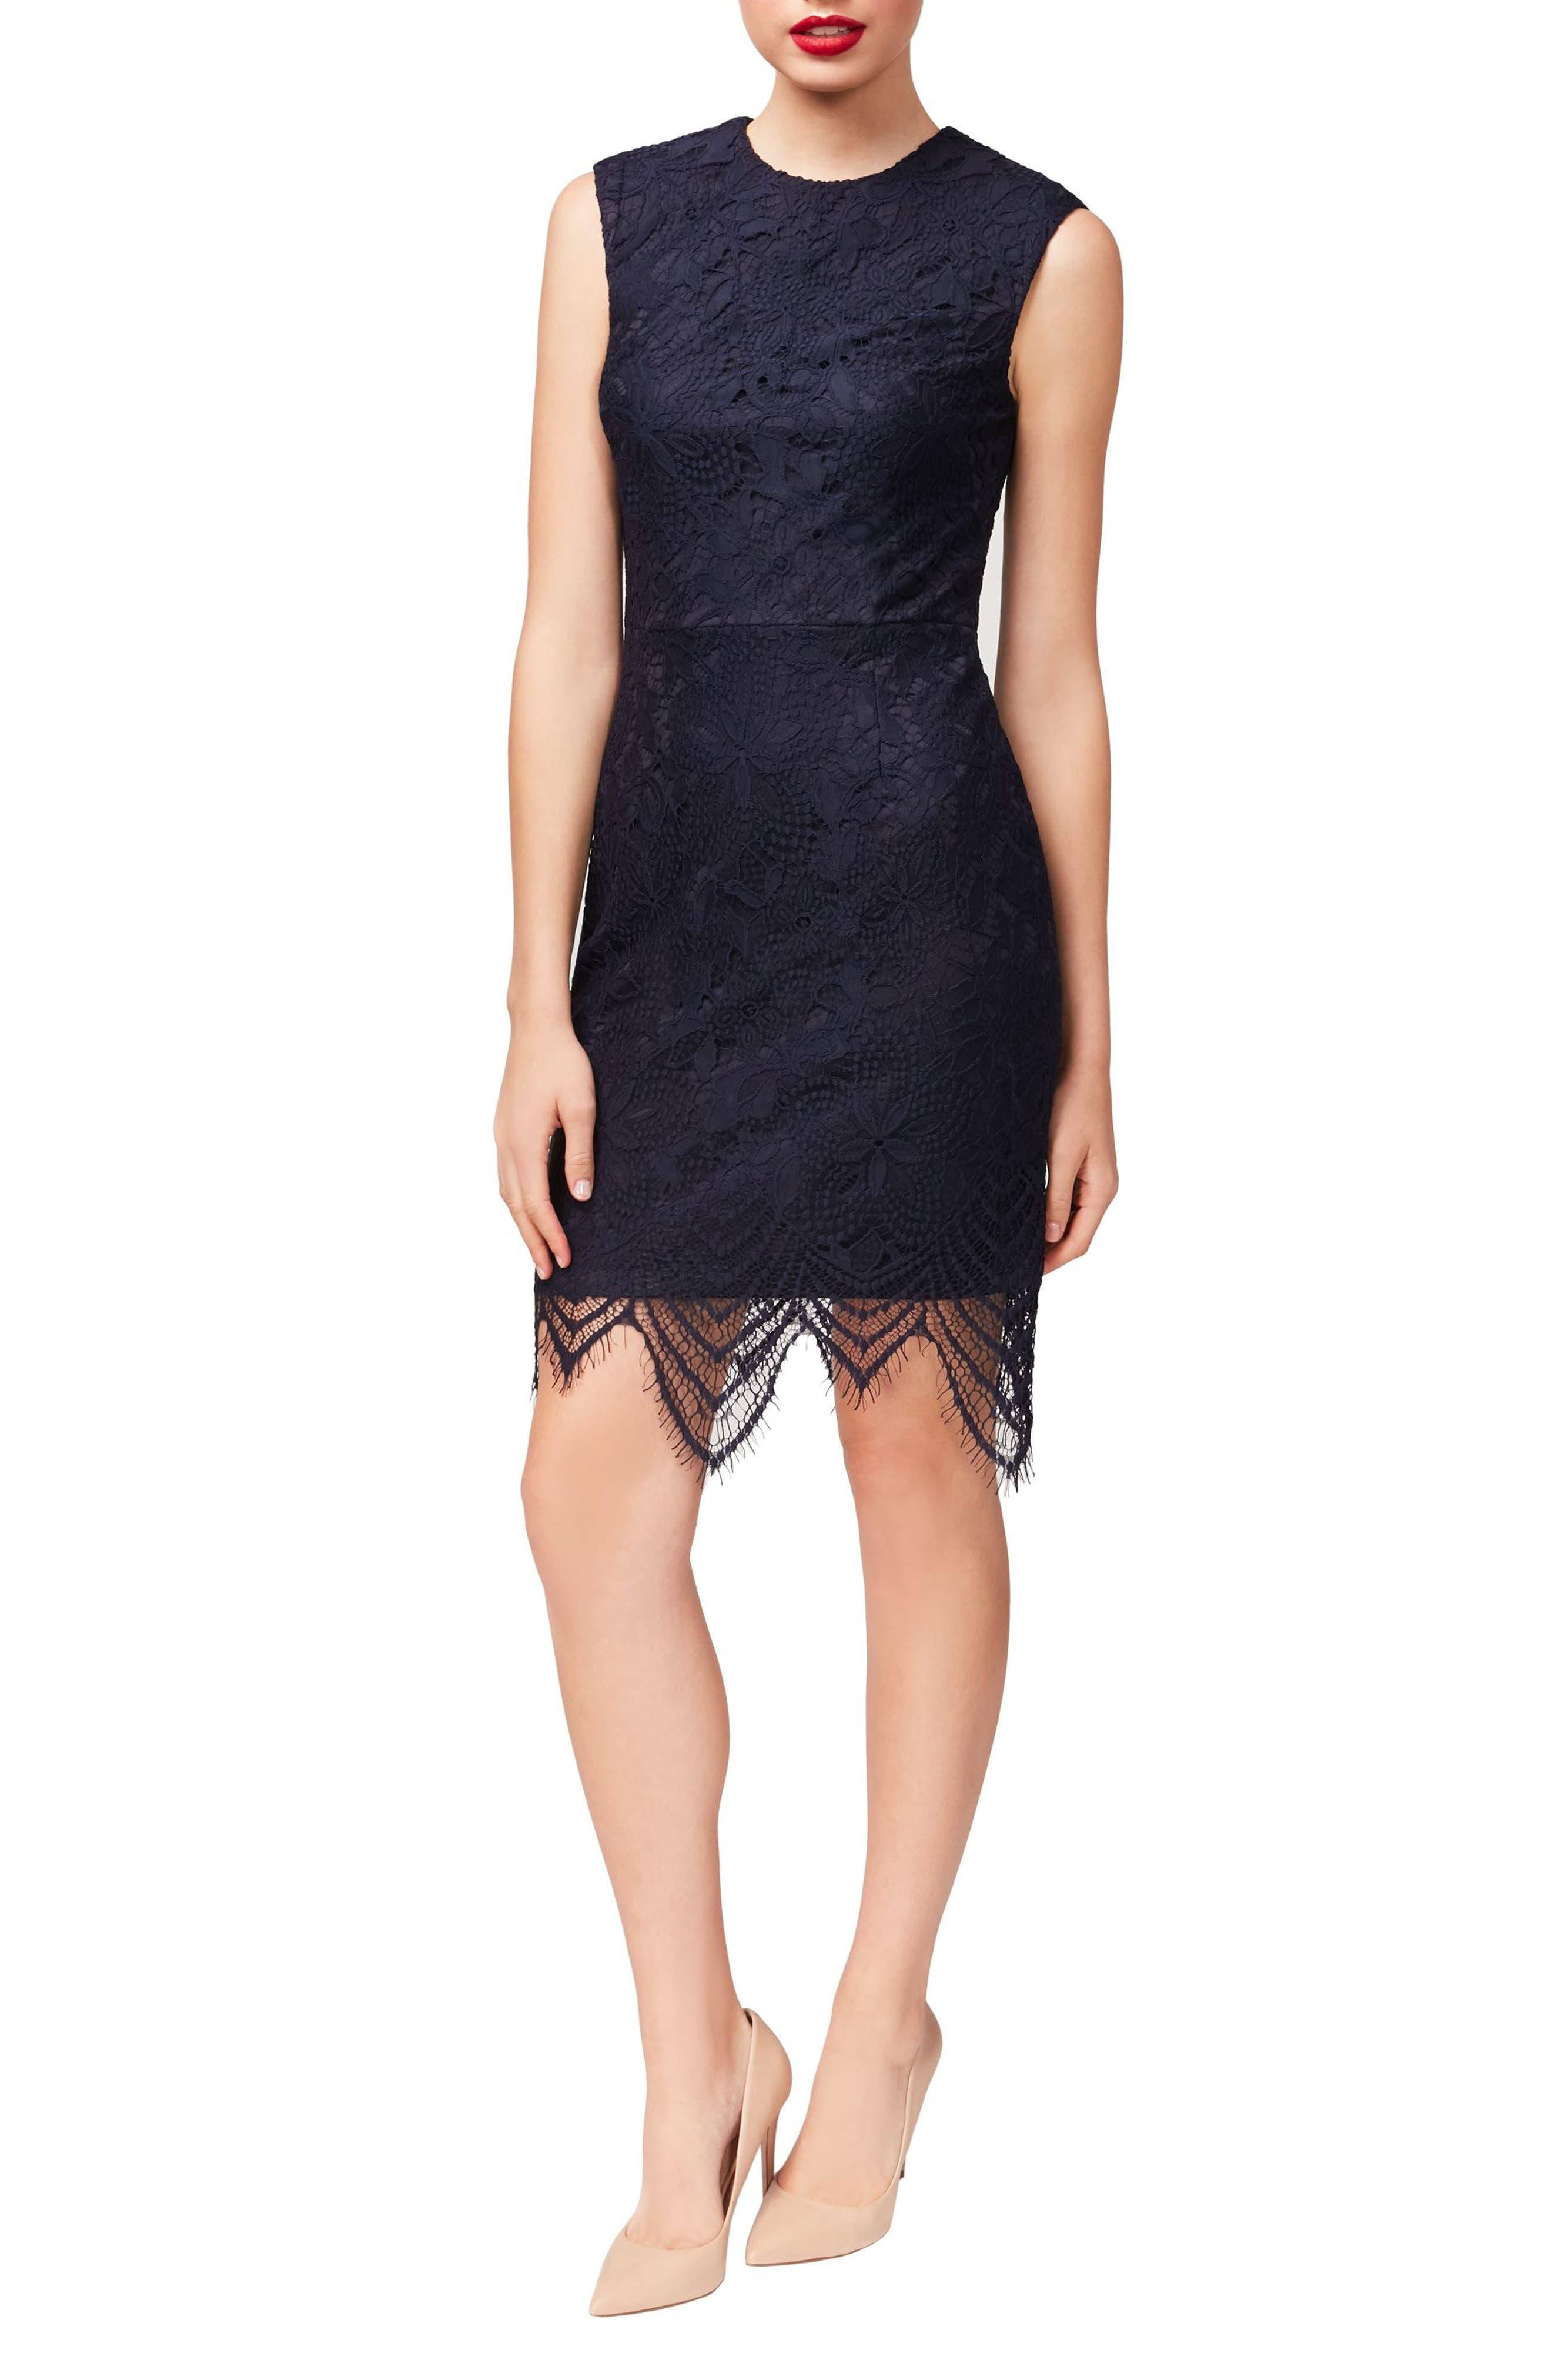 Alternate Image 1 Selected - Betsey Johnson Lace Sheath Dress